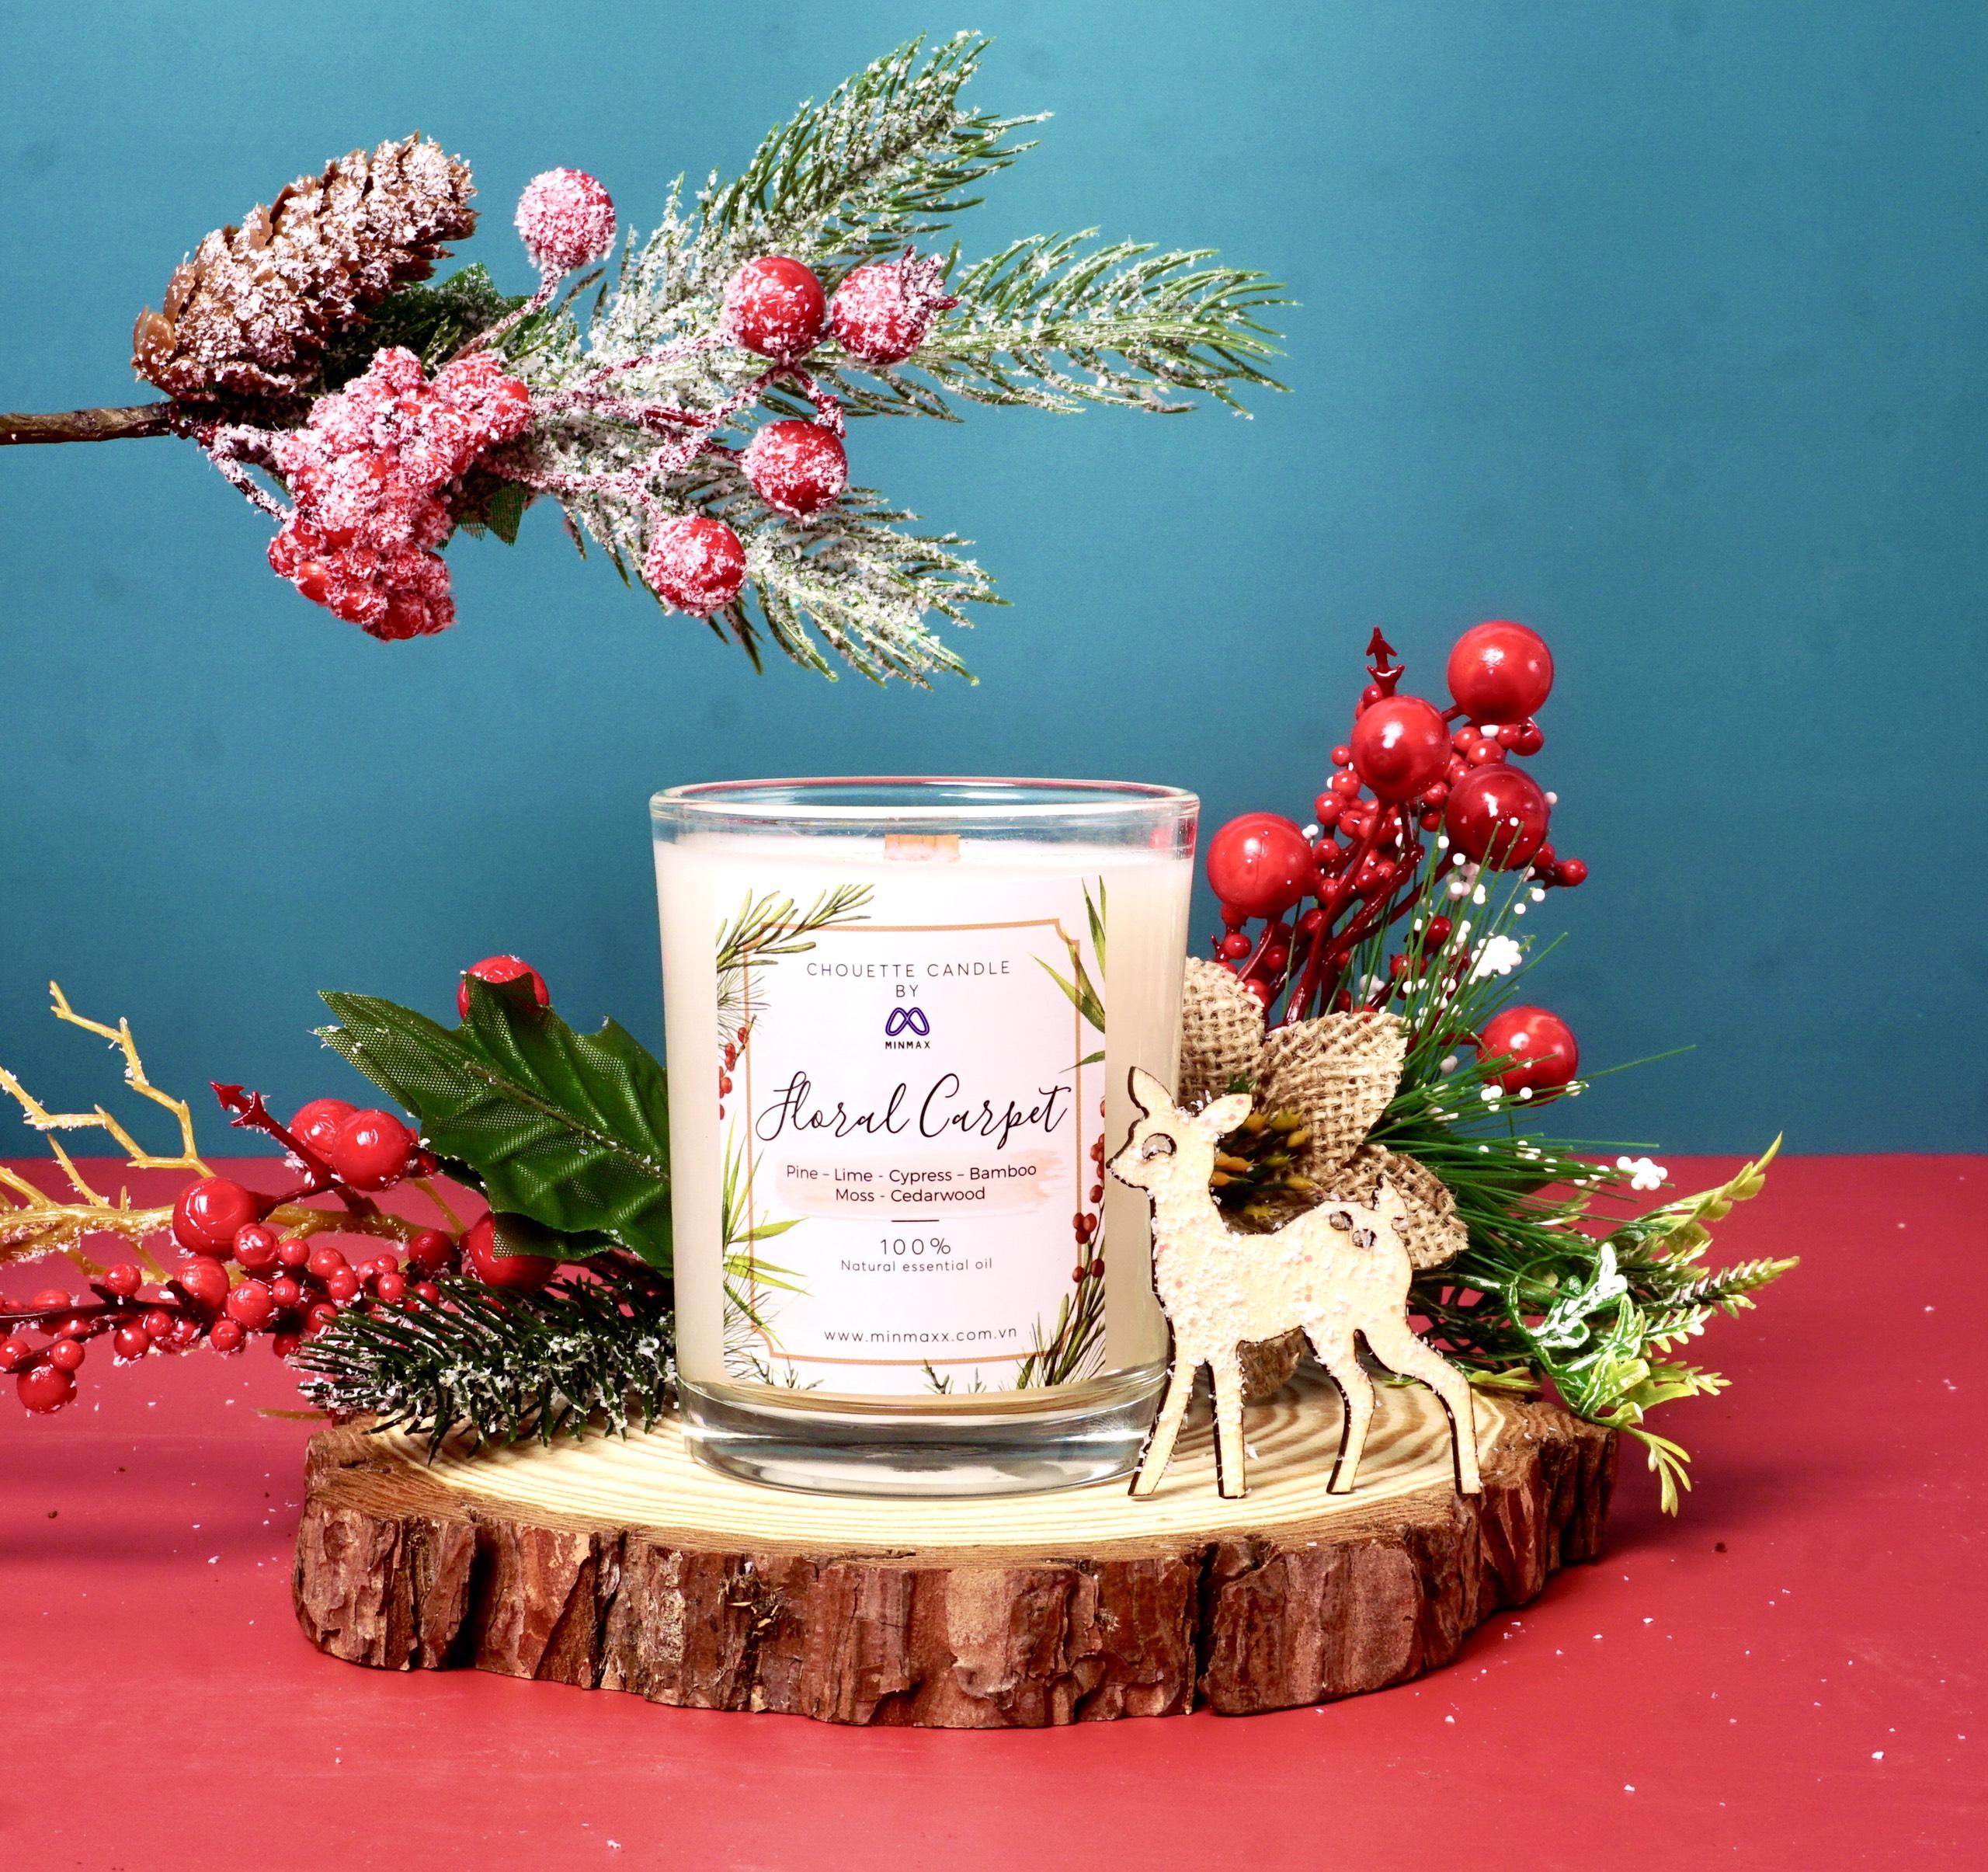 Nến thơm Chouette MinMax Floral Carpet 182g